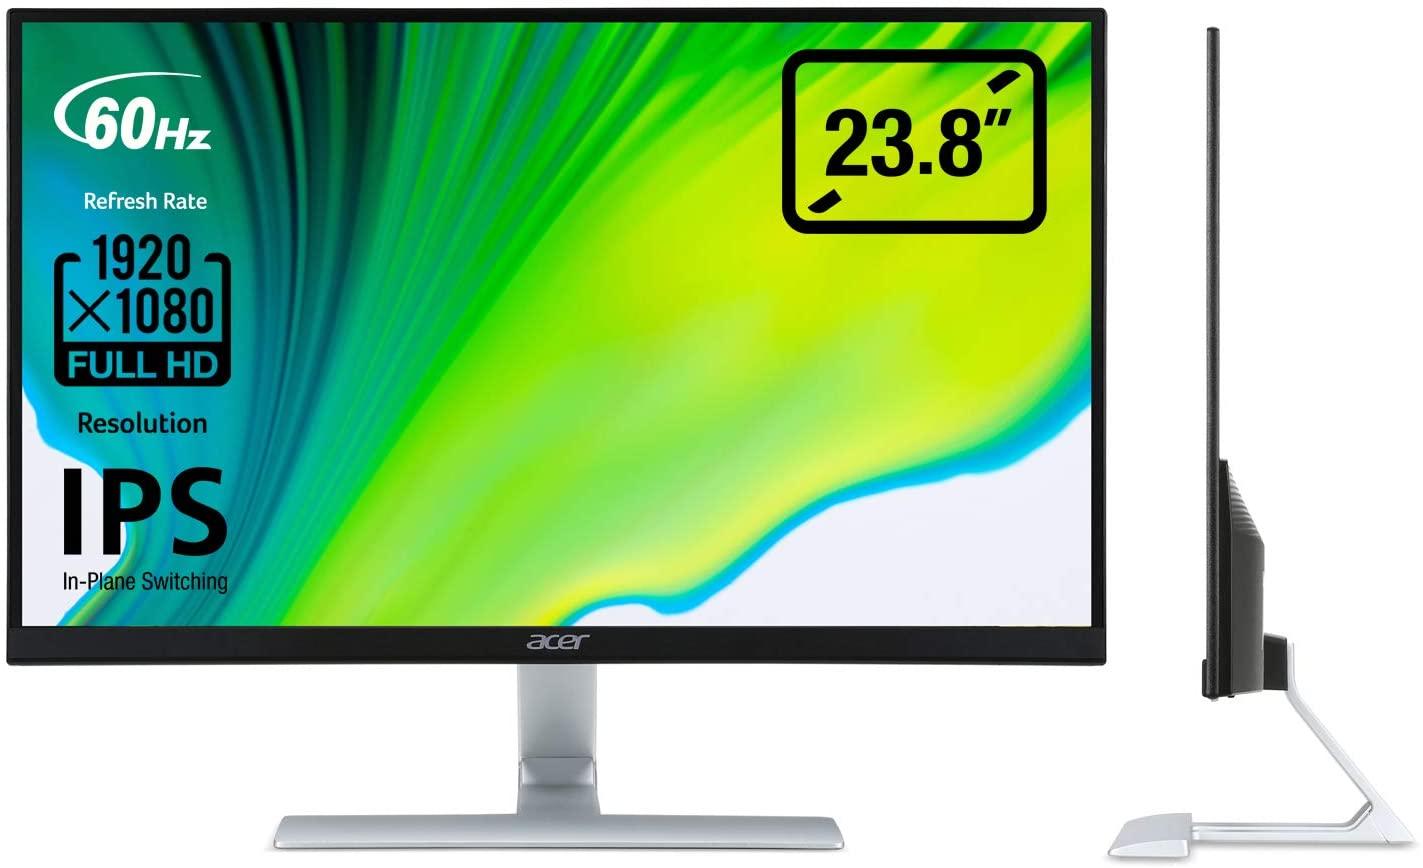 "Monitor Acer RT0 RT240Y IPS FULL HD 60 Hz (23,8"")"